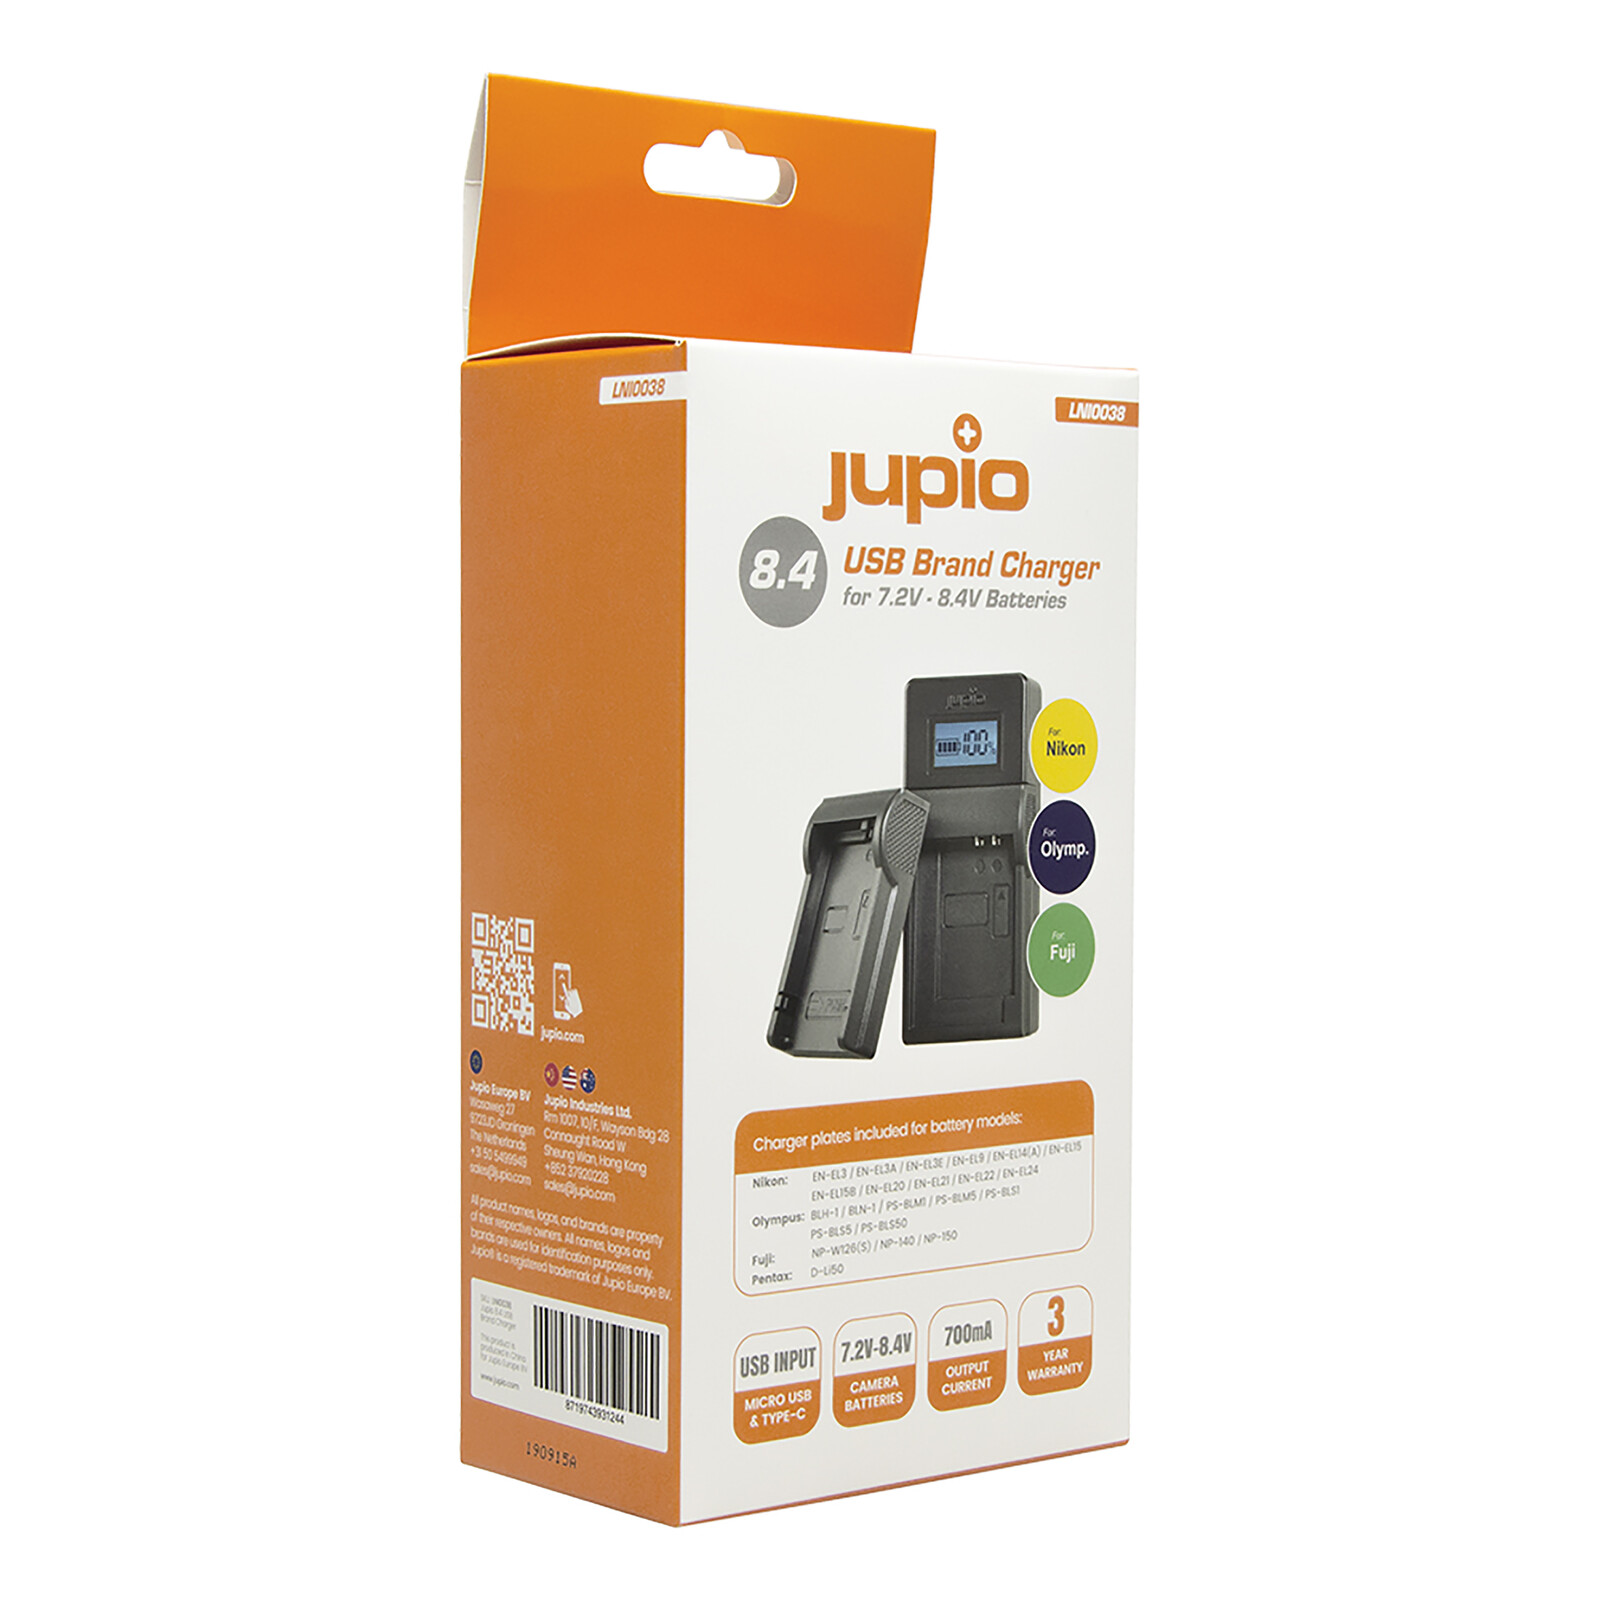 Jupio Brand Charger für Nikon, Fuji, Olympus 7.2-8.4V